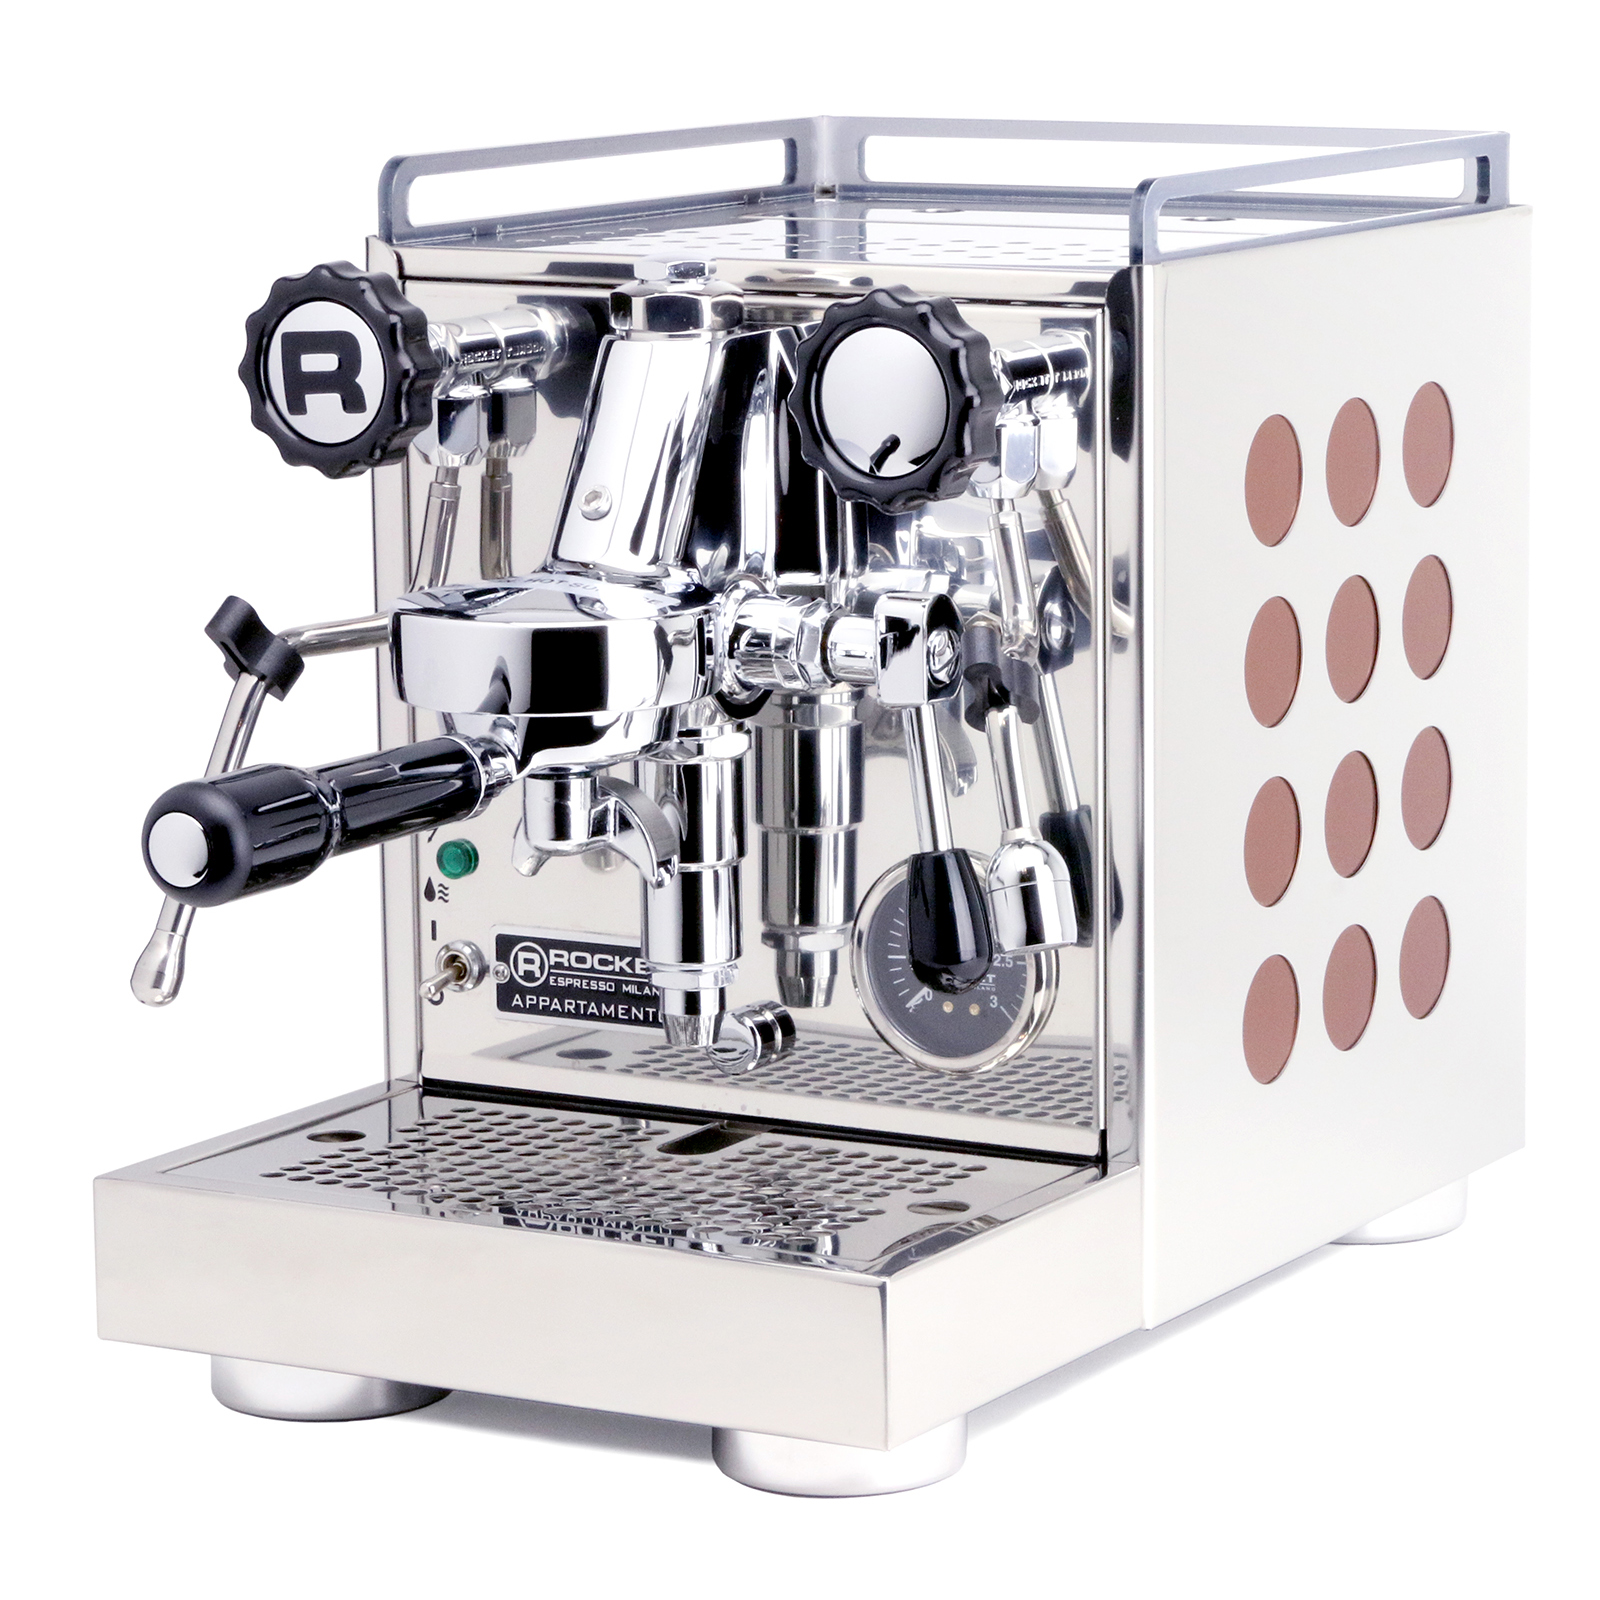 Rocket Apartamento Espresso Machine